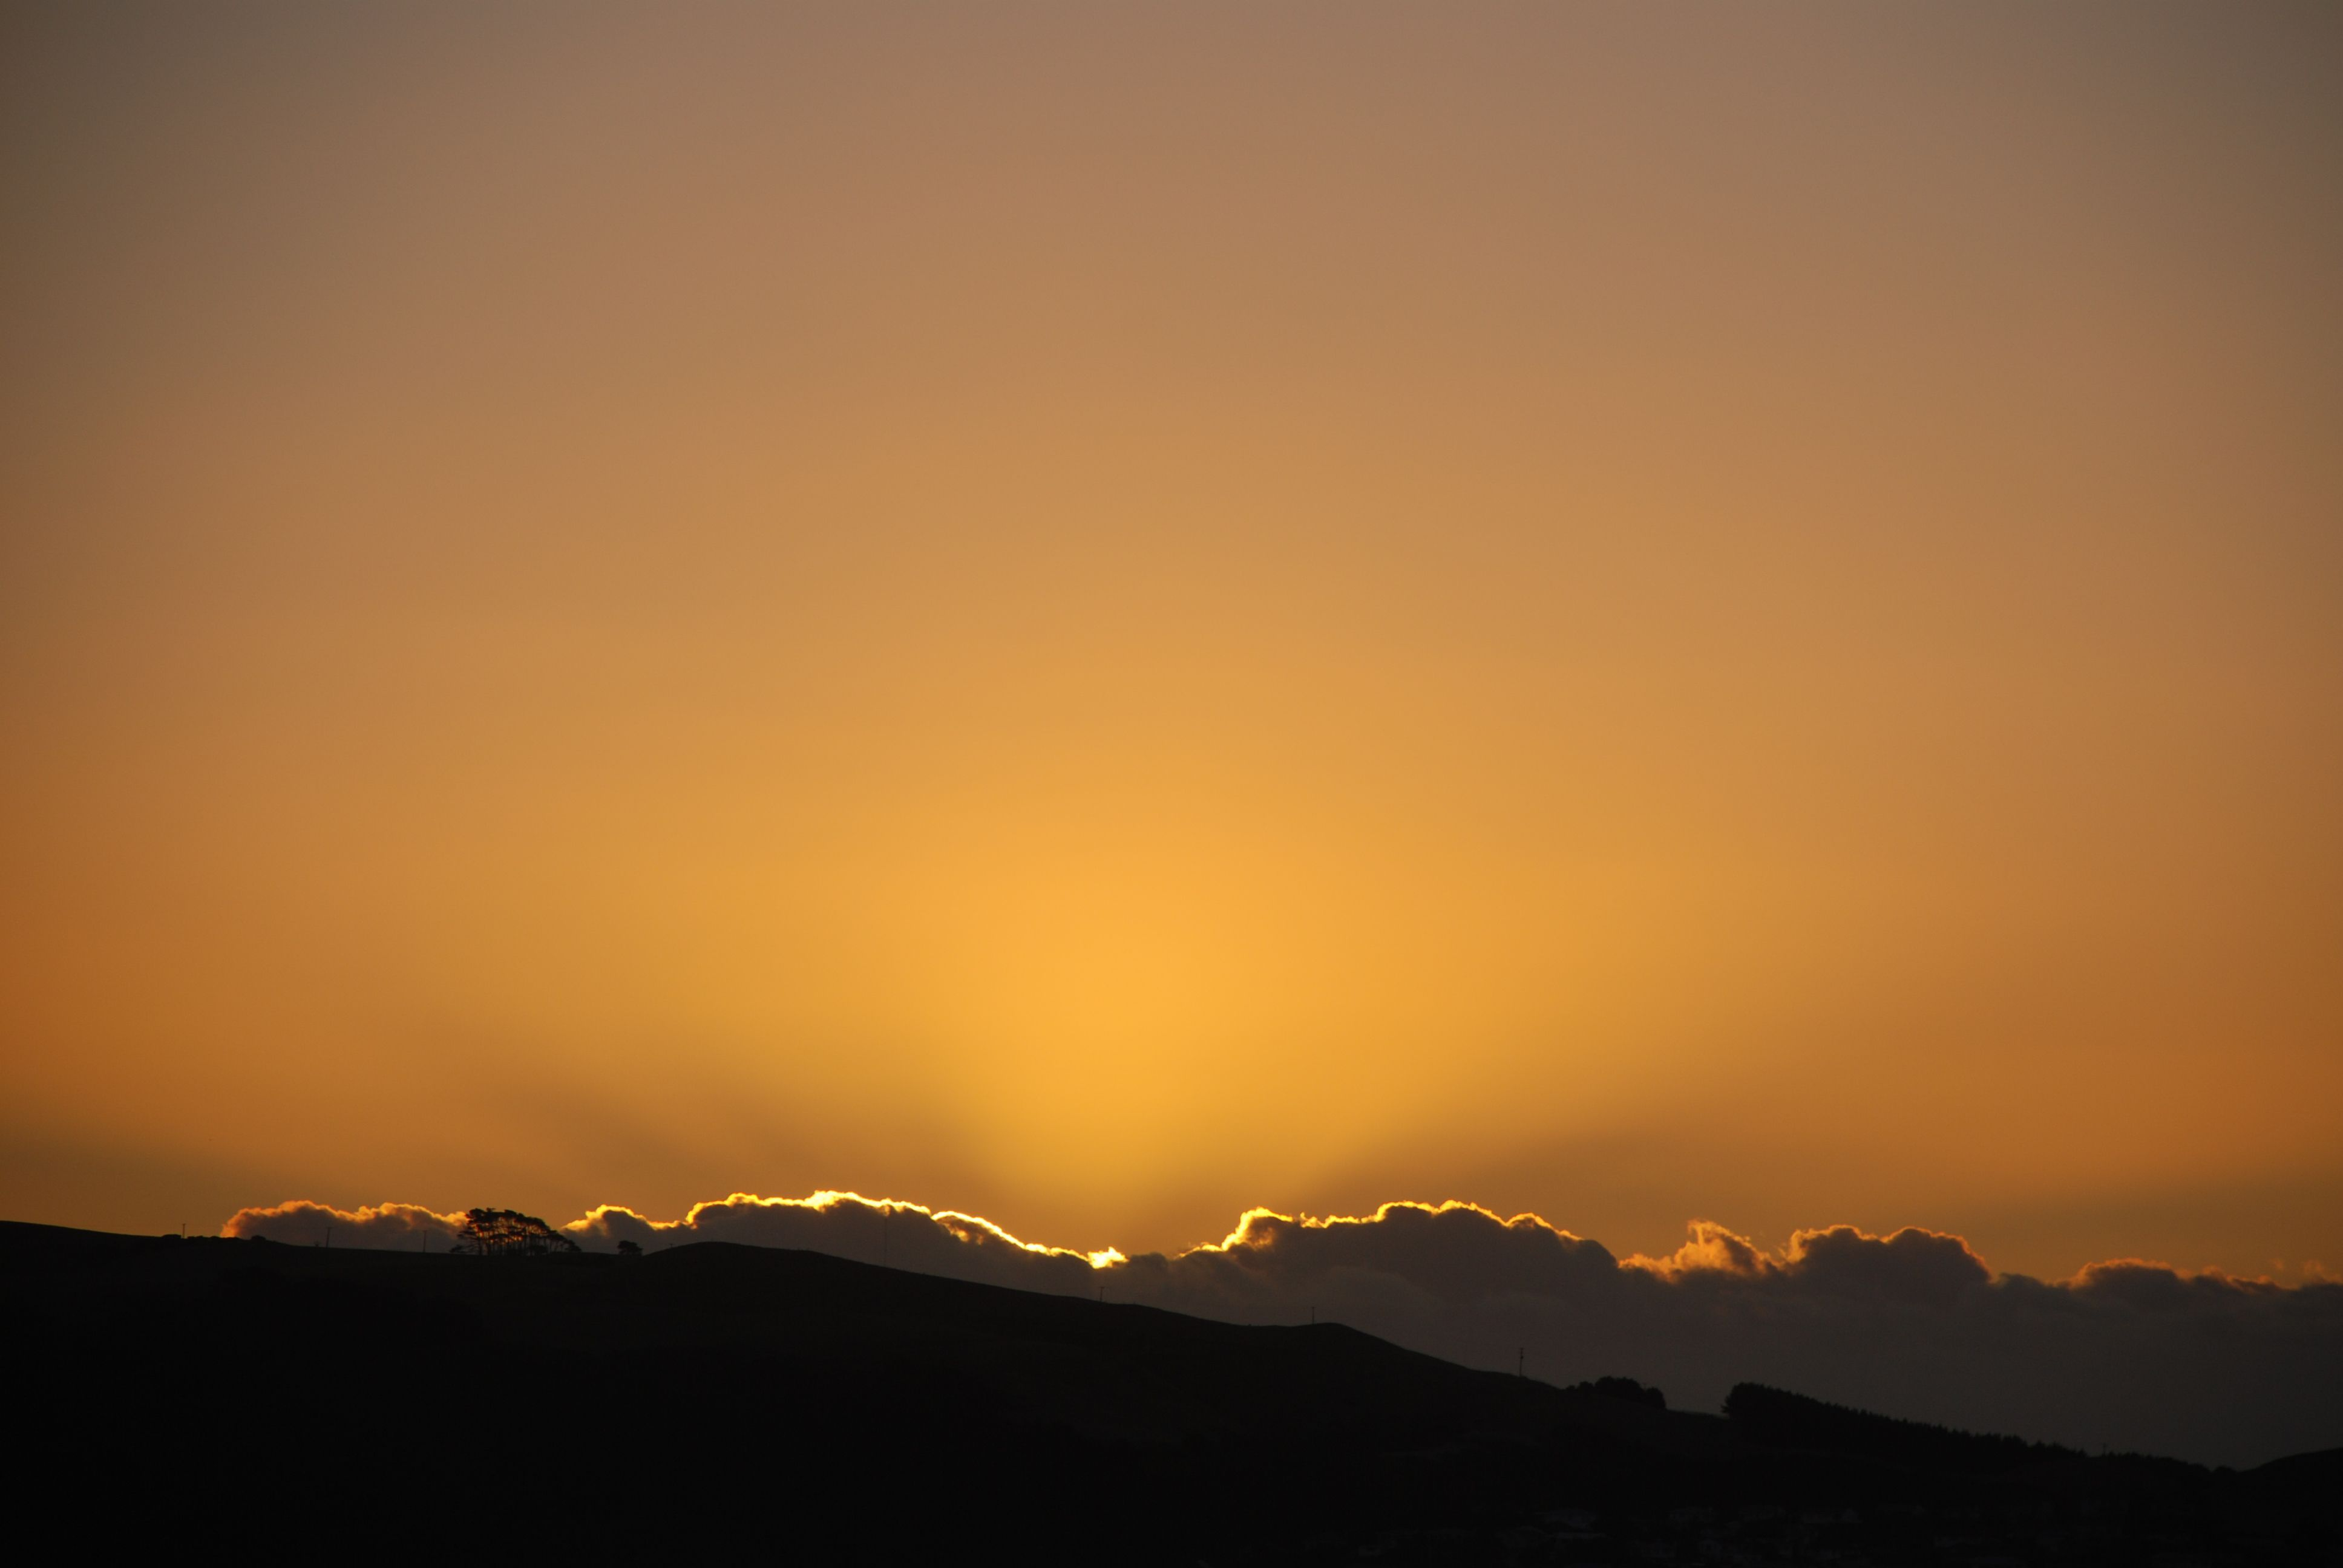 pin golden sunset hd - photo #39